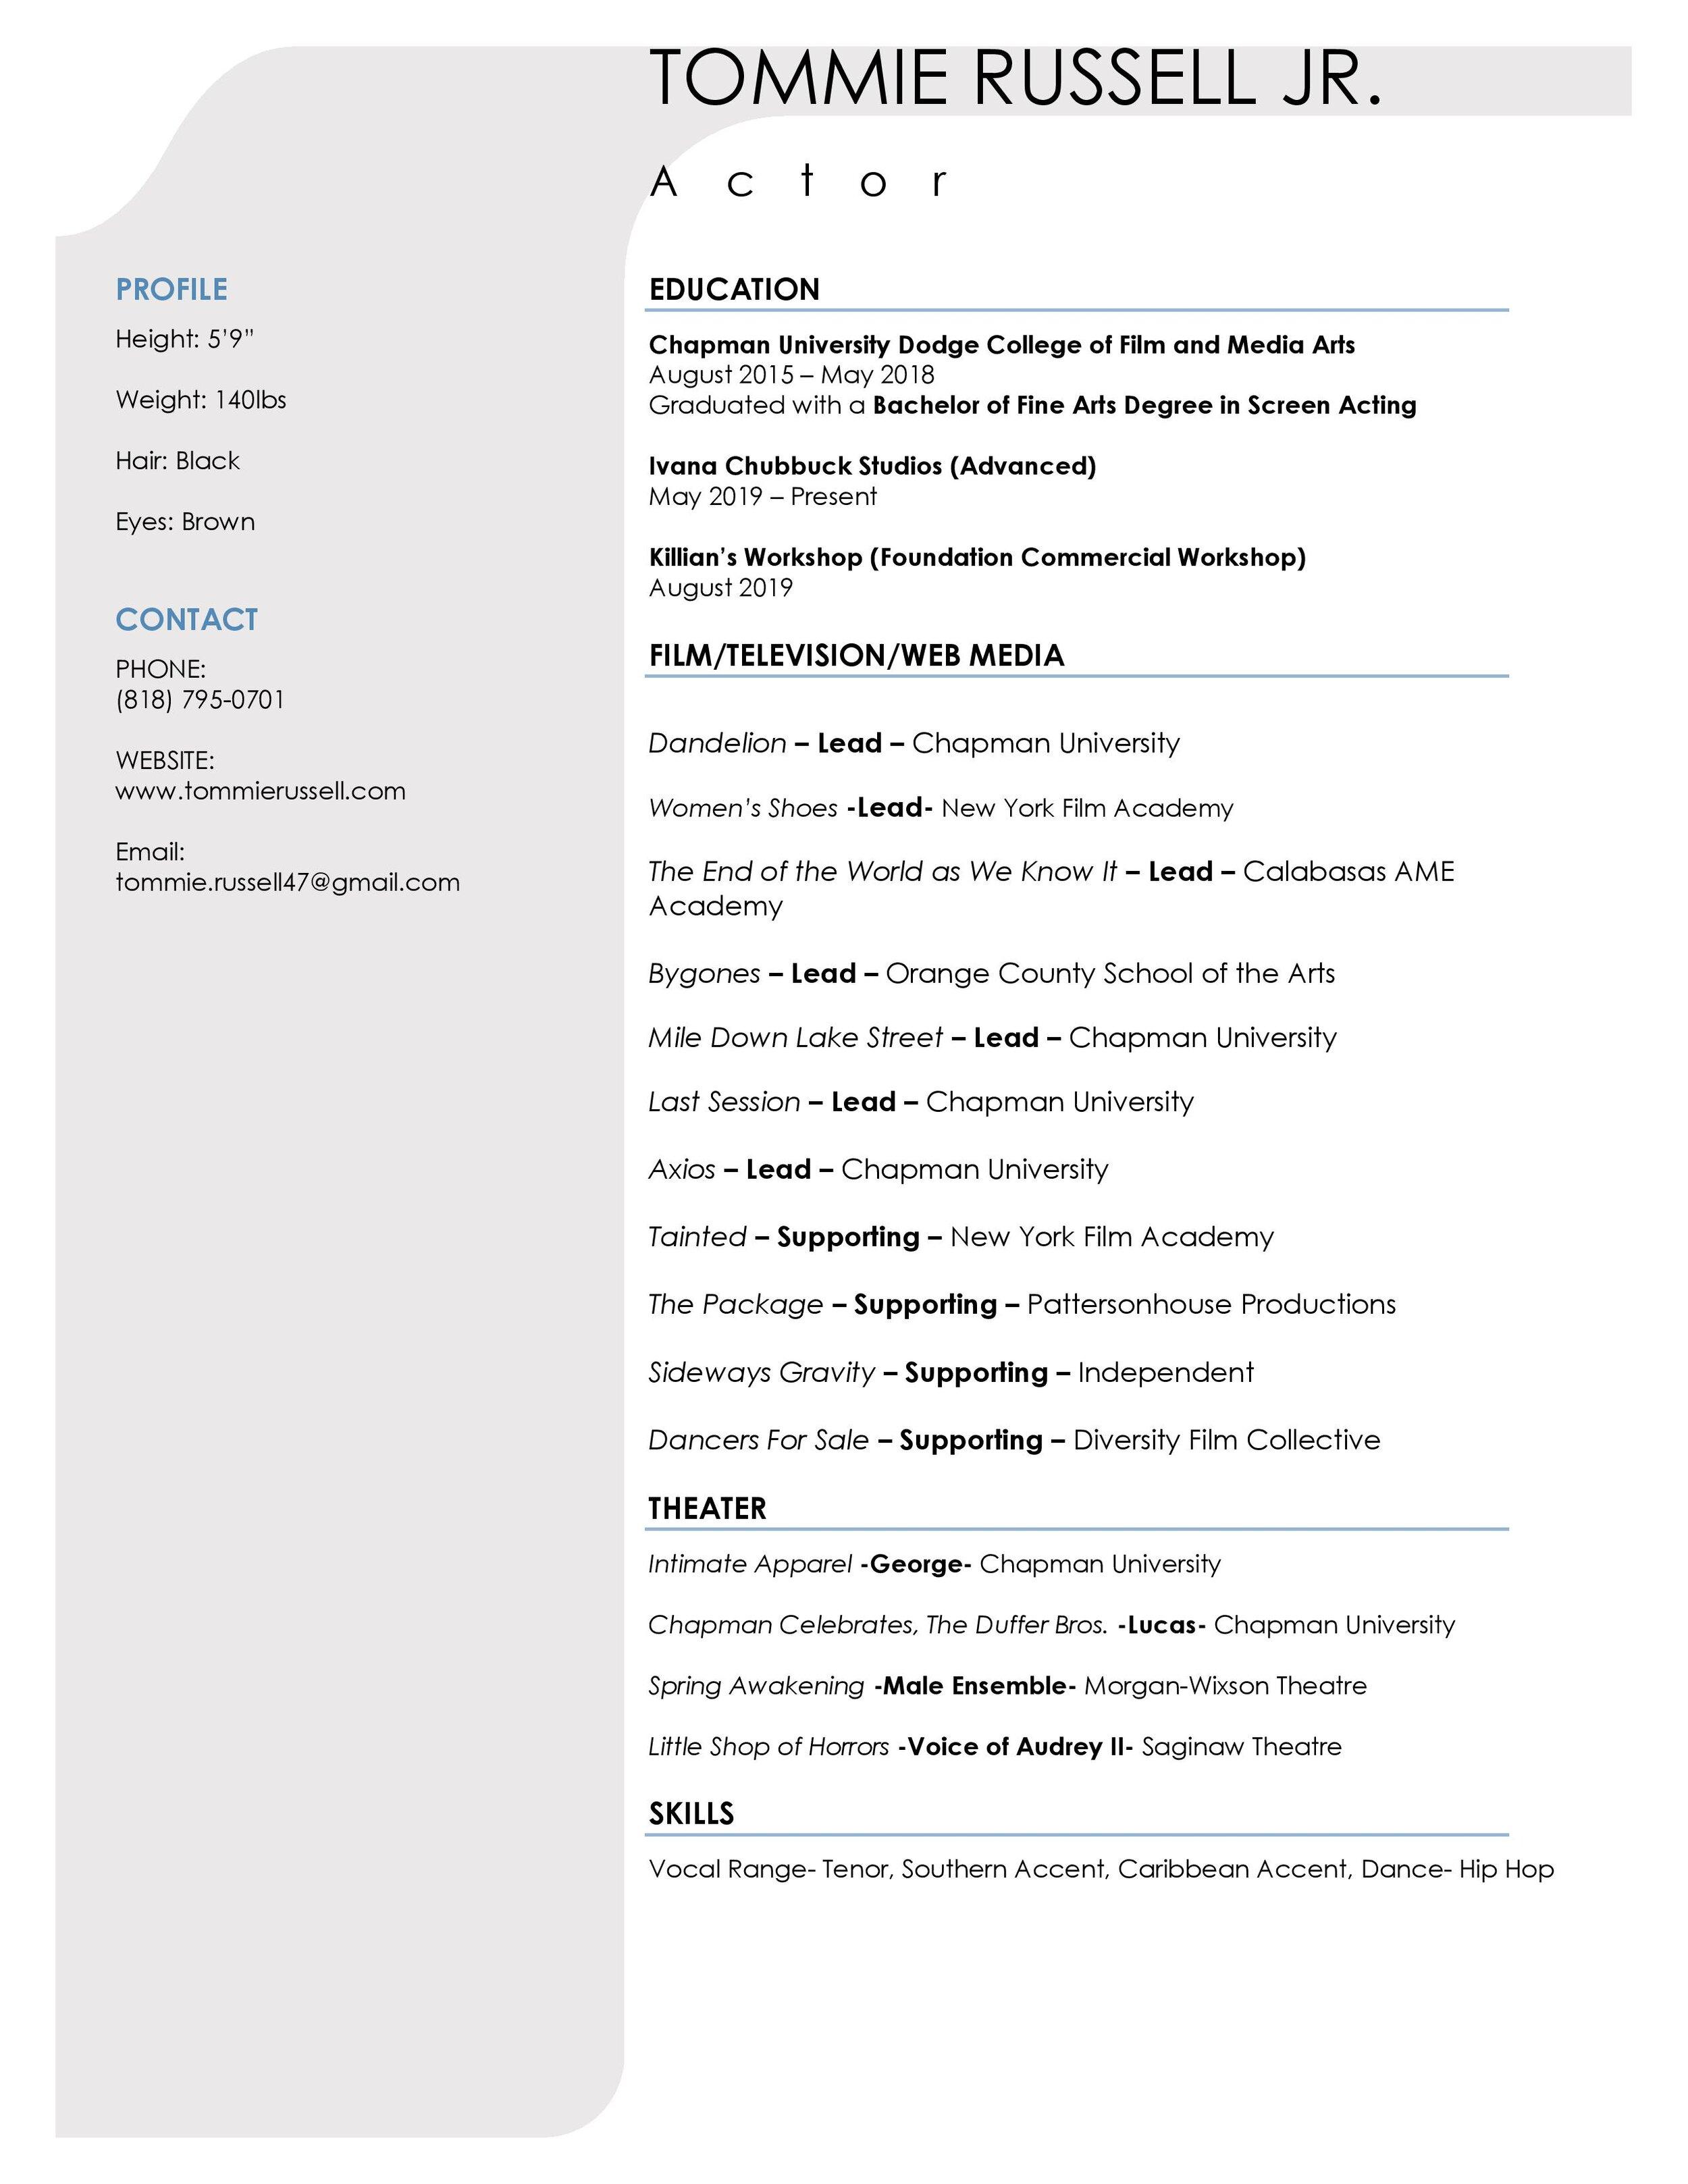 Updated Entertainment Resume  Website-page-001.jpg